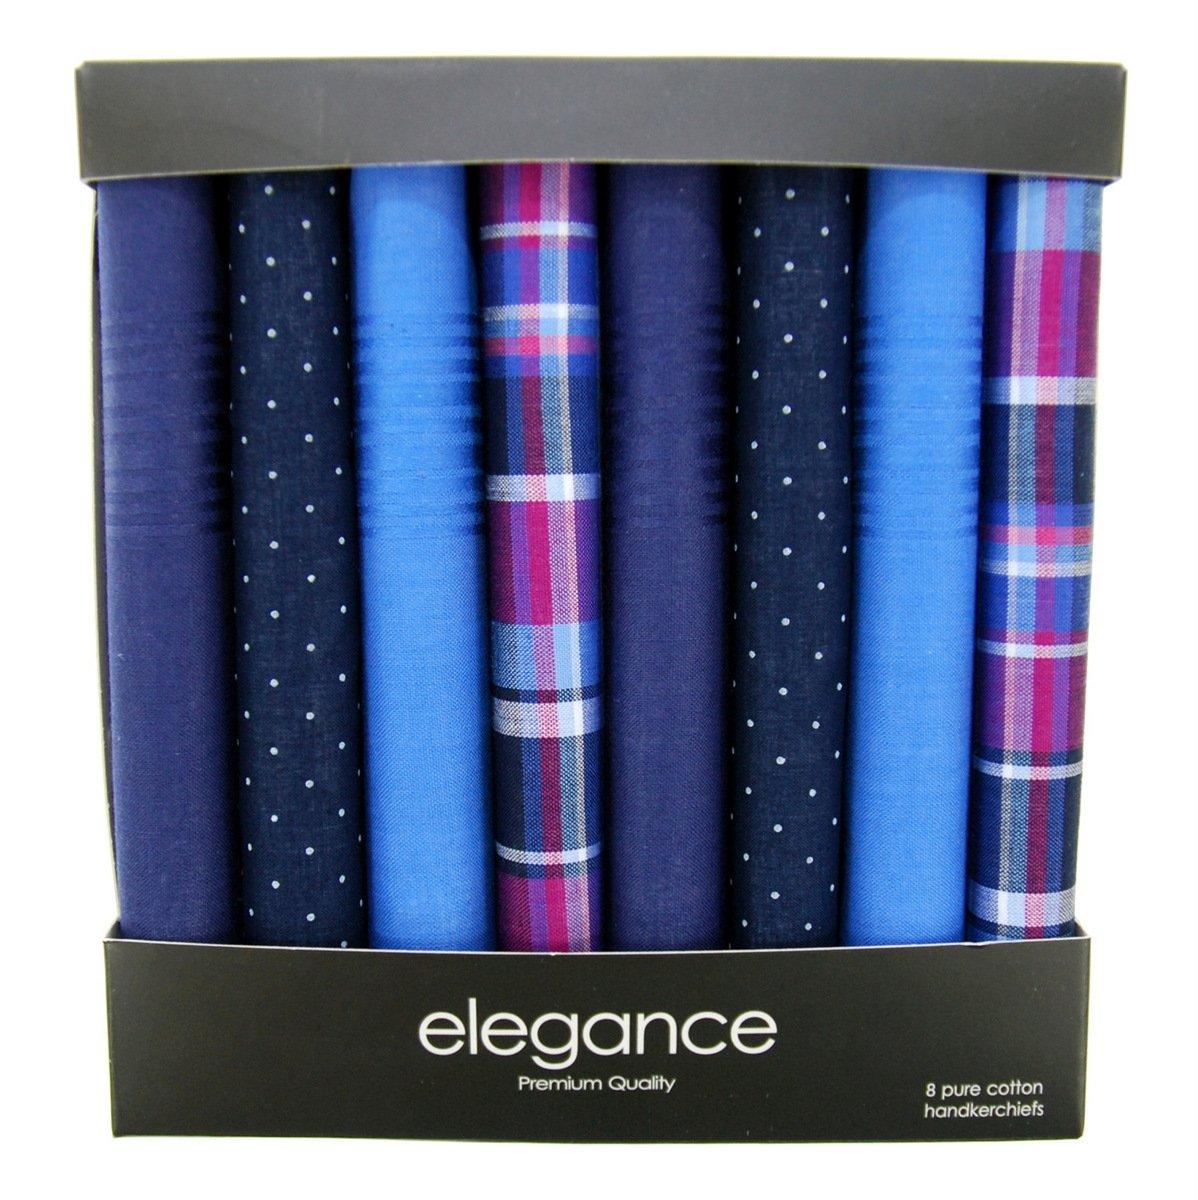 Retreez 8 Piece Pure Cotton Assorted Men's Handkerchiefs Hanky Gift Box Set - Assorted Set A5A001